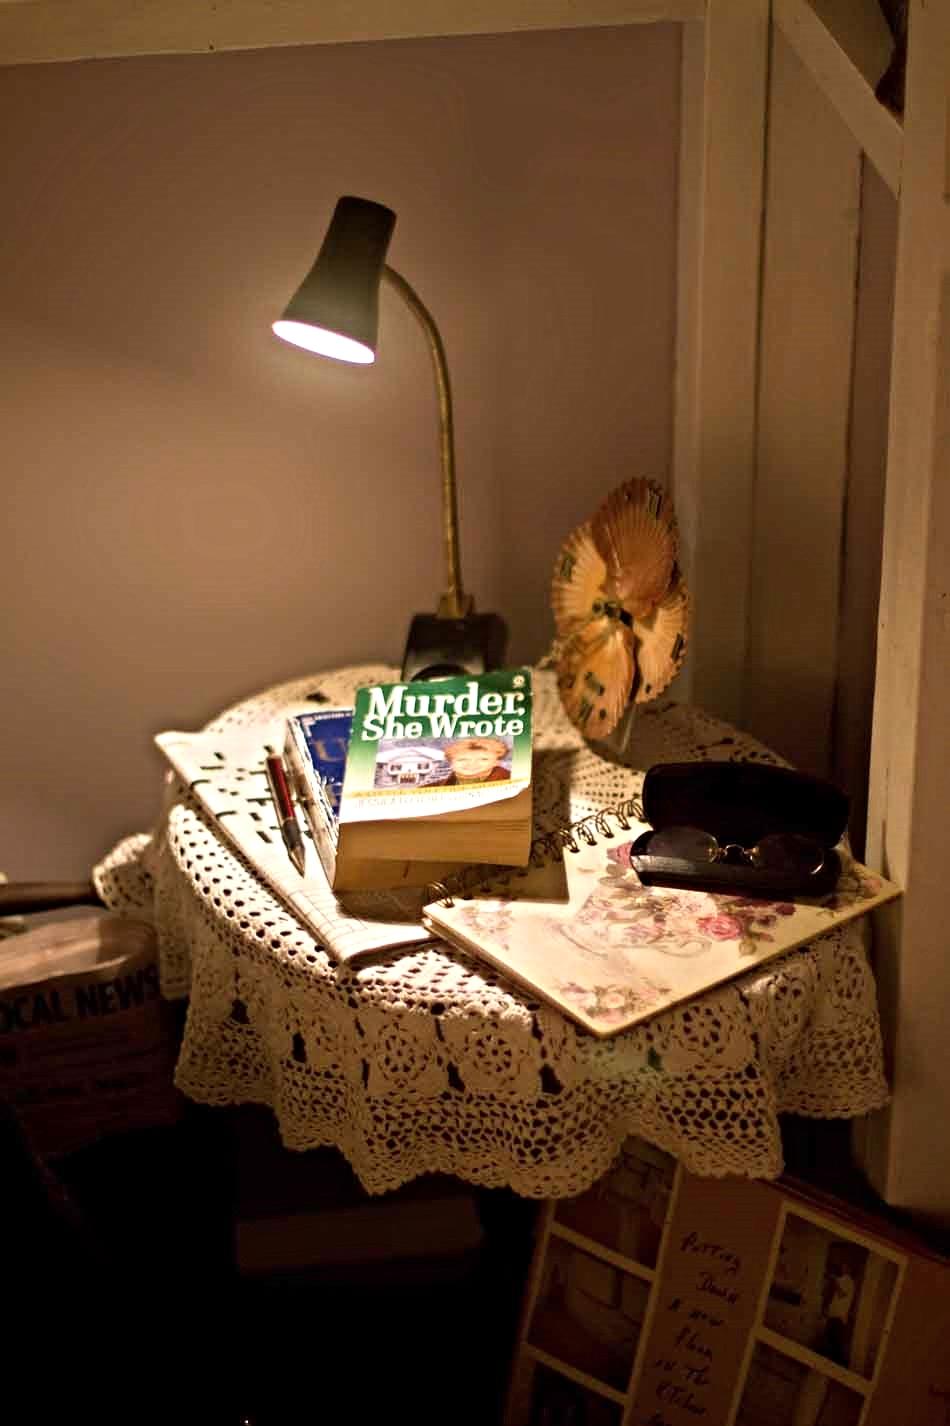 Kiosk: Rent-a-Grandma, 2012, interior, installation at the Philadelphia Art Alliance, collaboration with Amy Linsenmayer